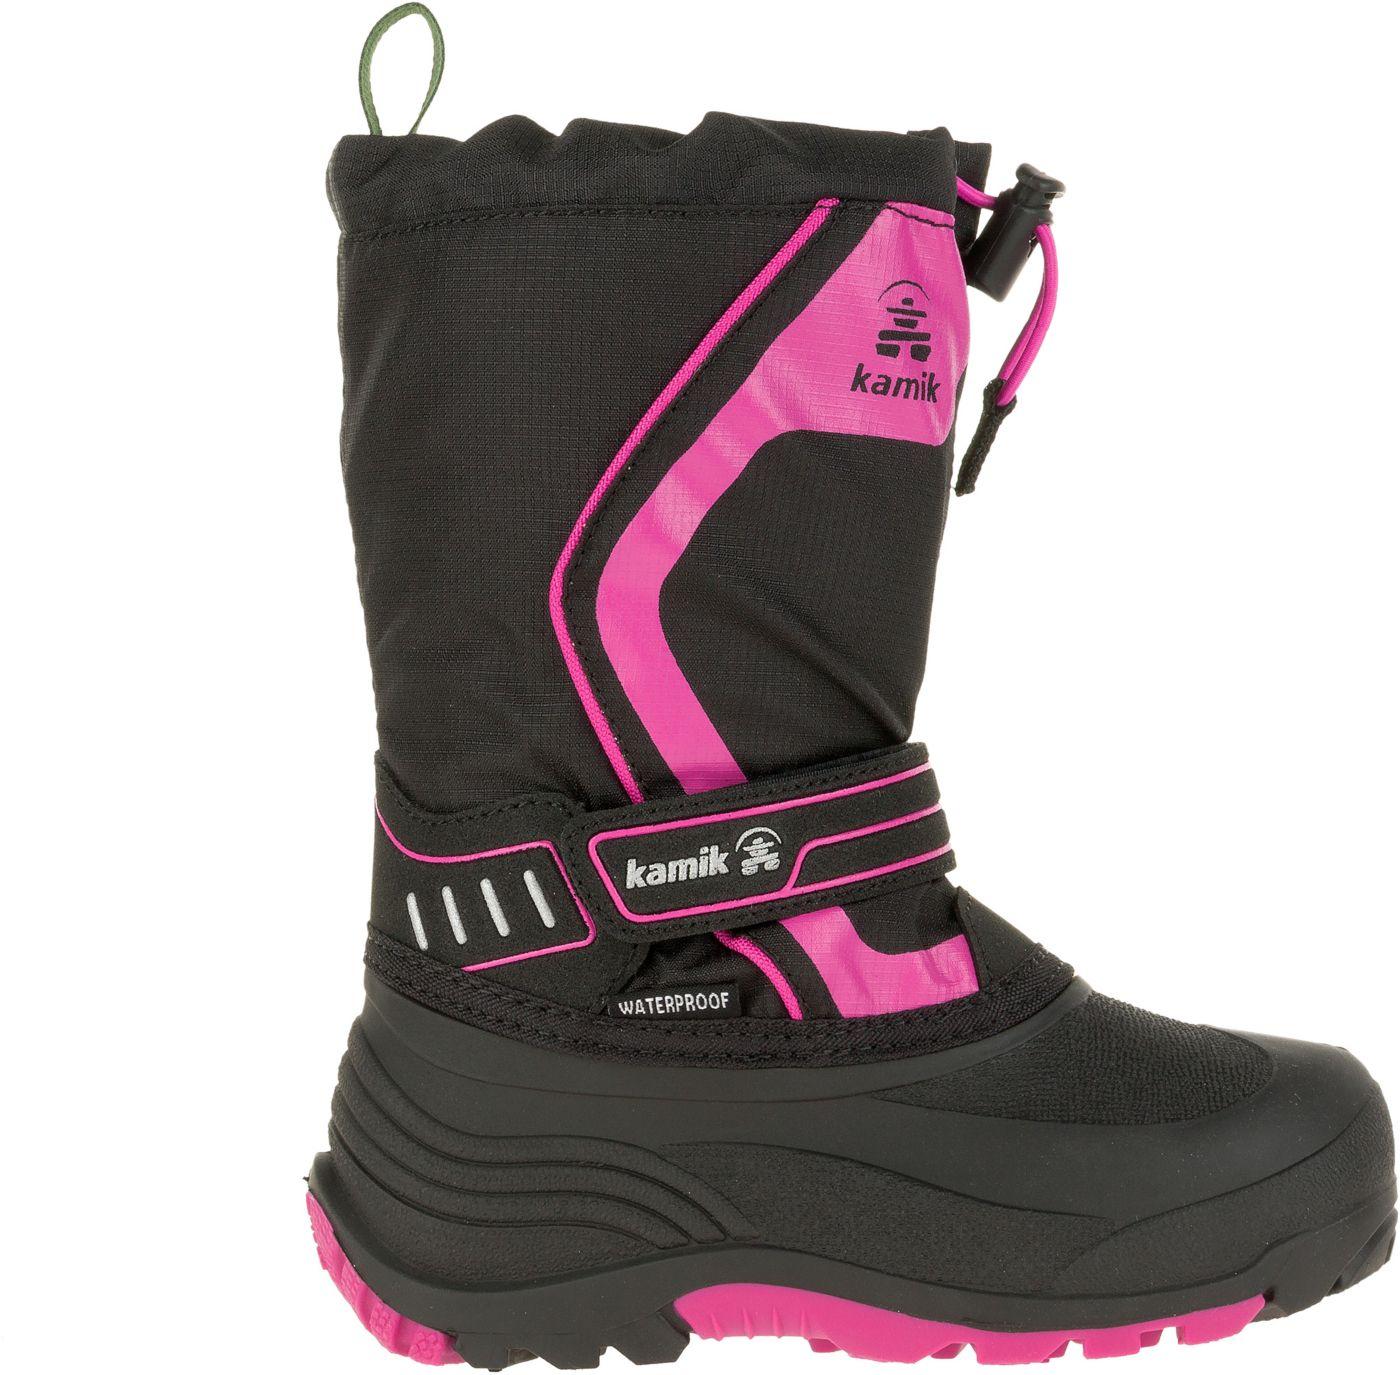 Kamik Kids' Snowcoast Insulated Waterproof Winter Boots